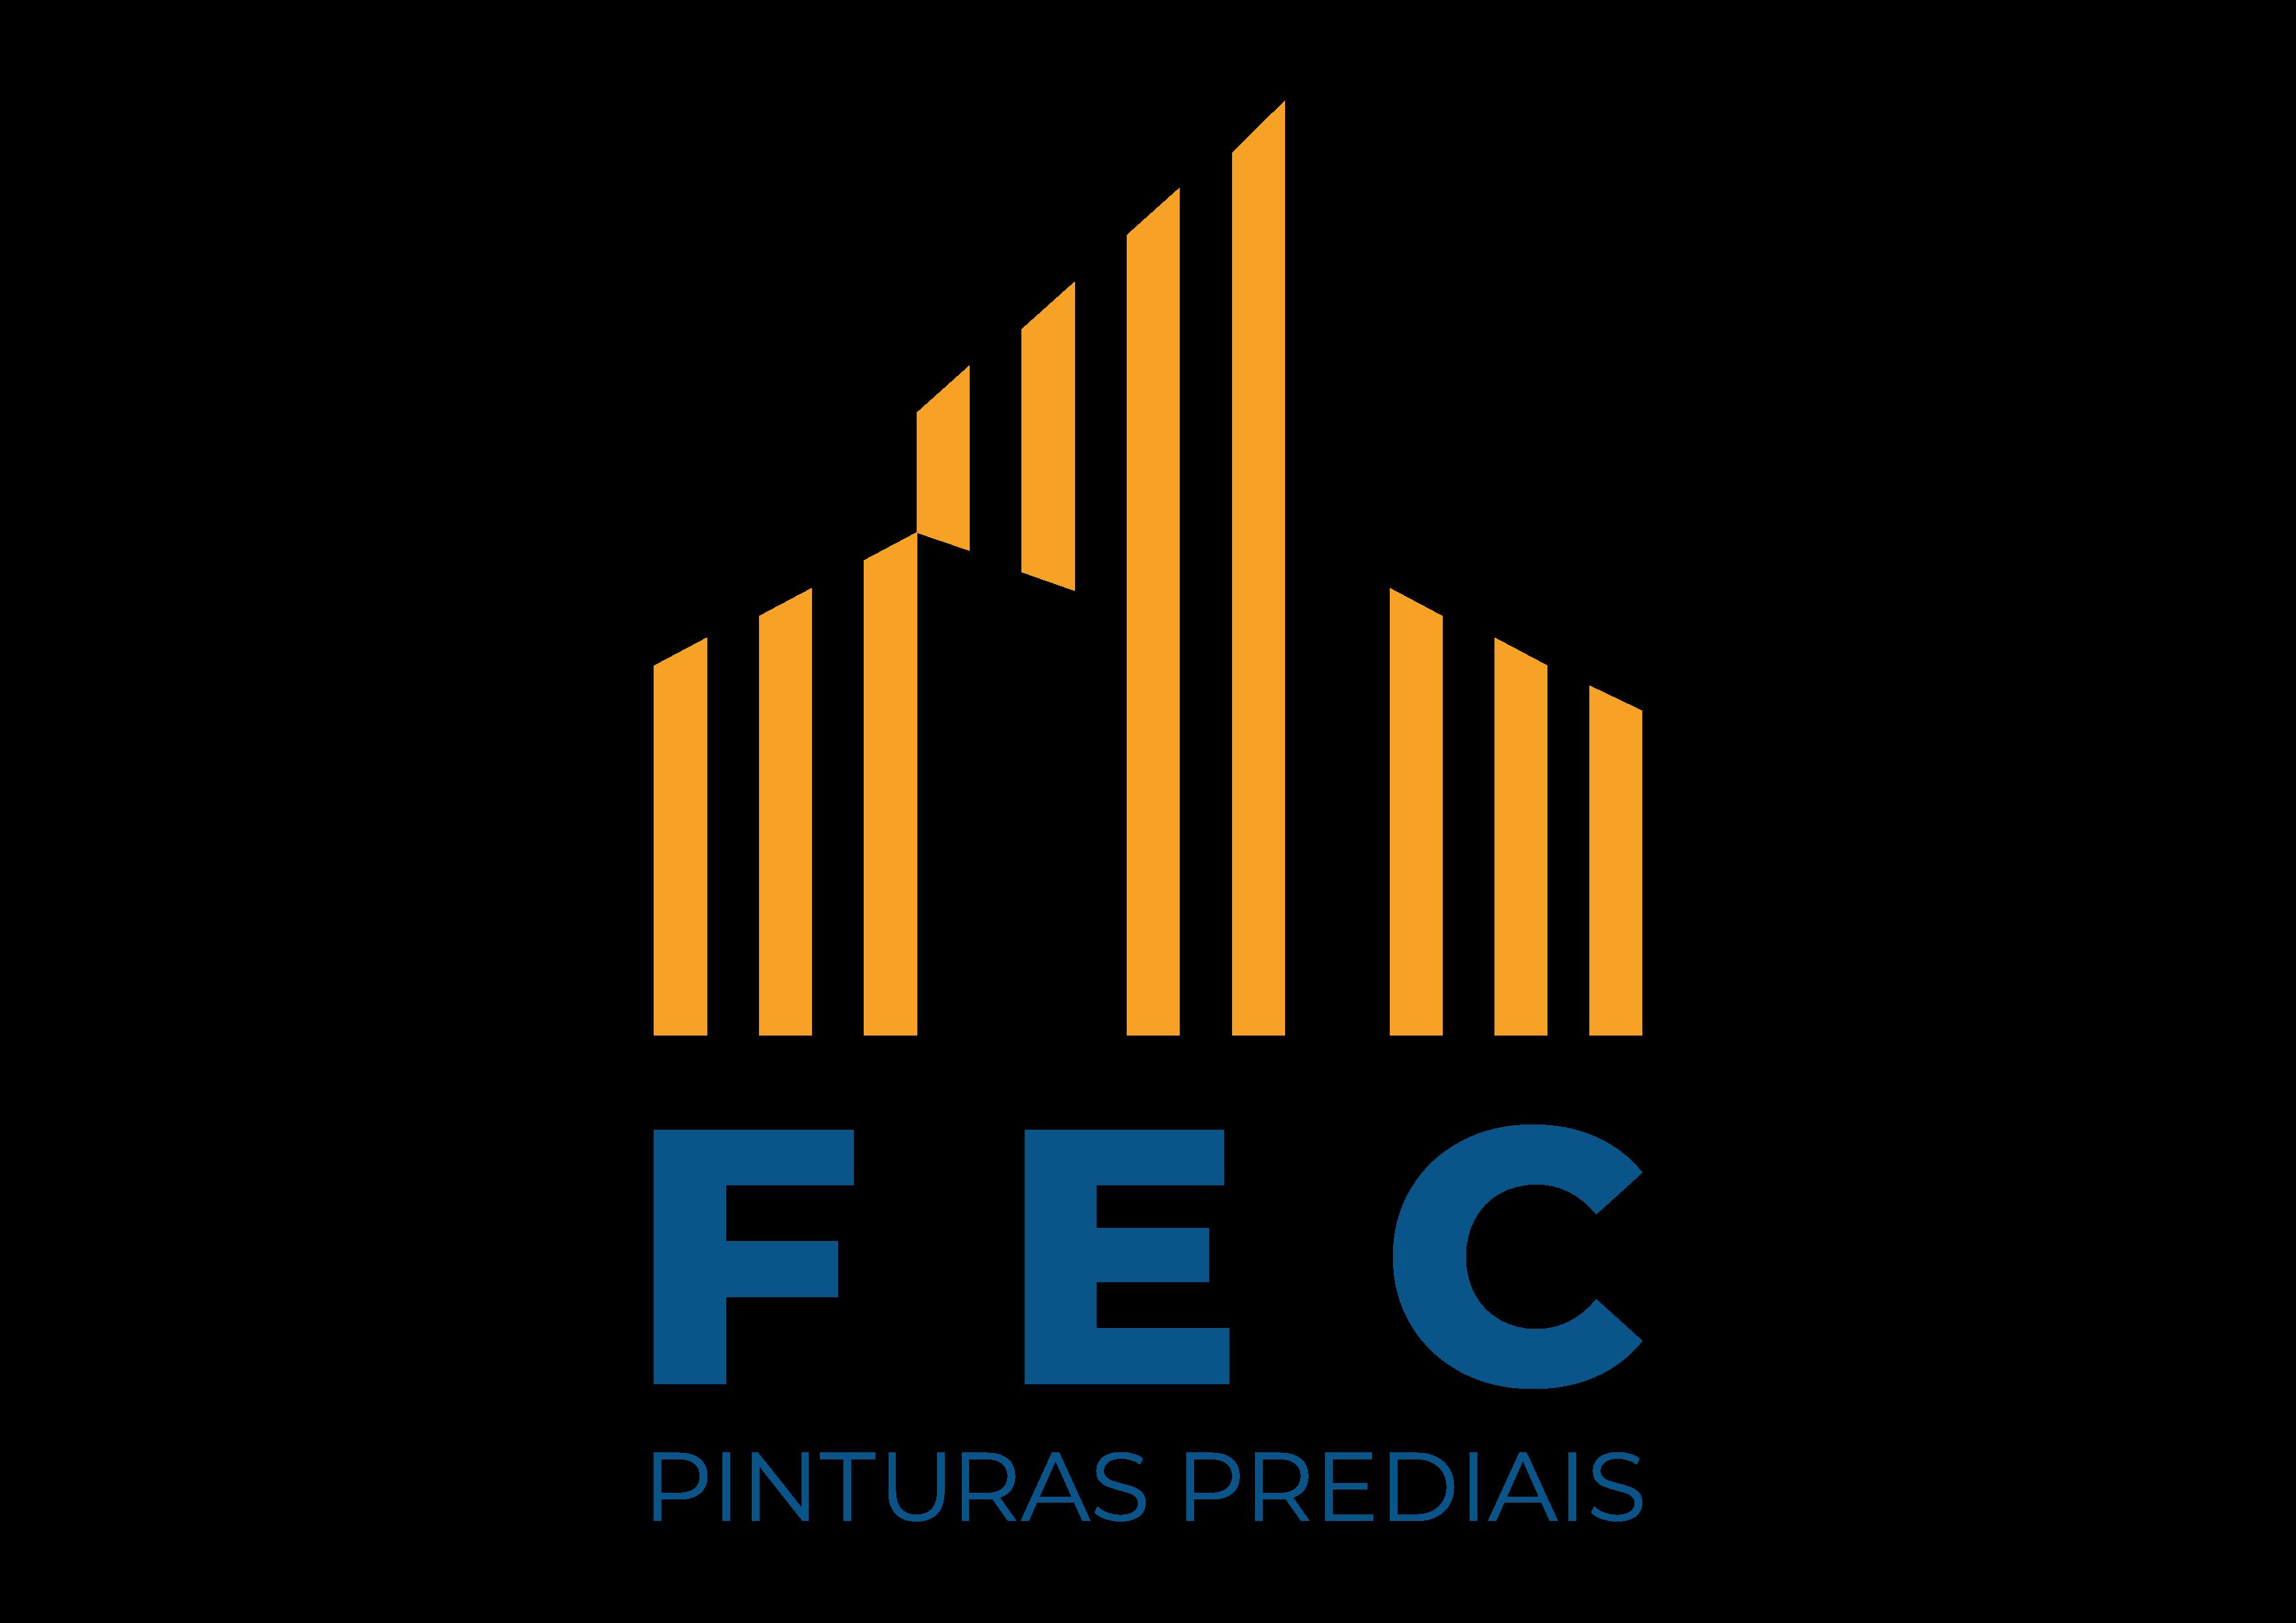 serviço de pintura de fachada de casas - FEC Pinturas